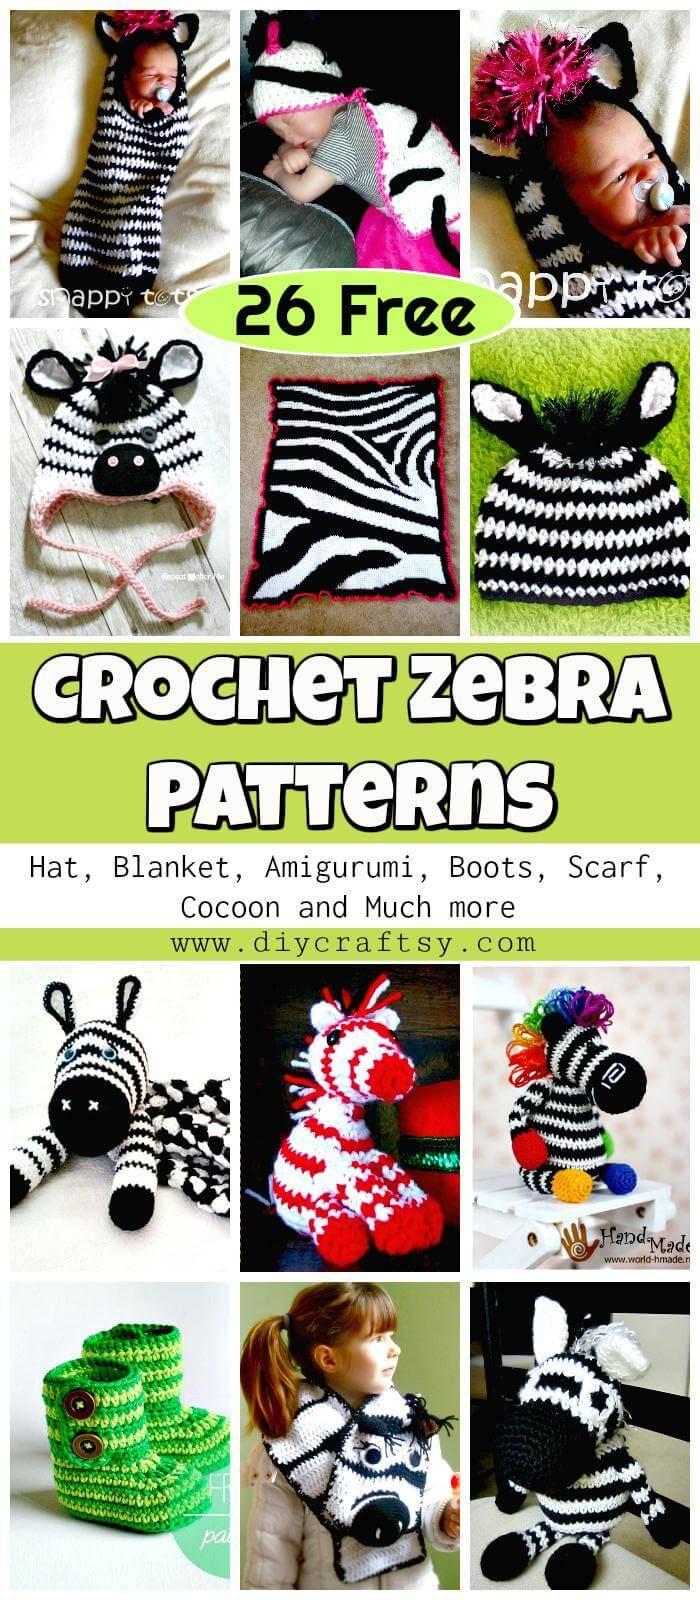 Free Crochet Zebra Patterns - Crochet Hat, Blanket, Amigurumi